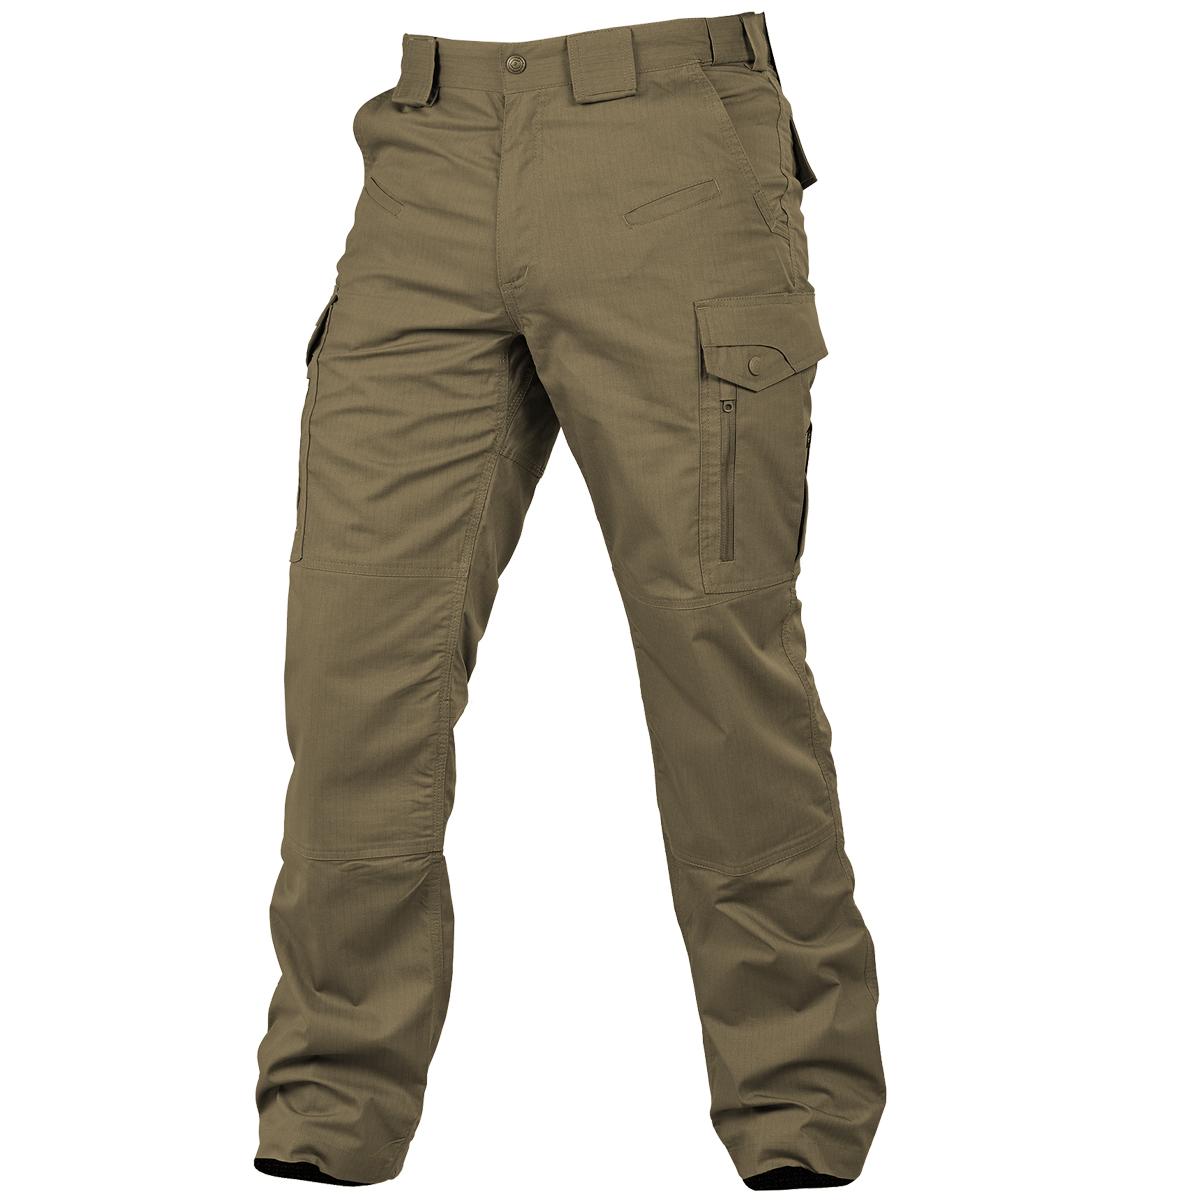 pentagon ranger pants airsoft survival army combat wear